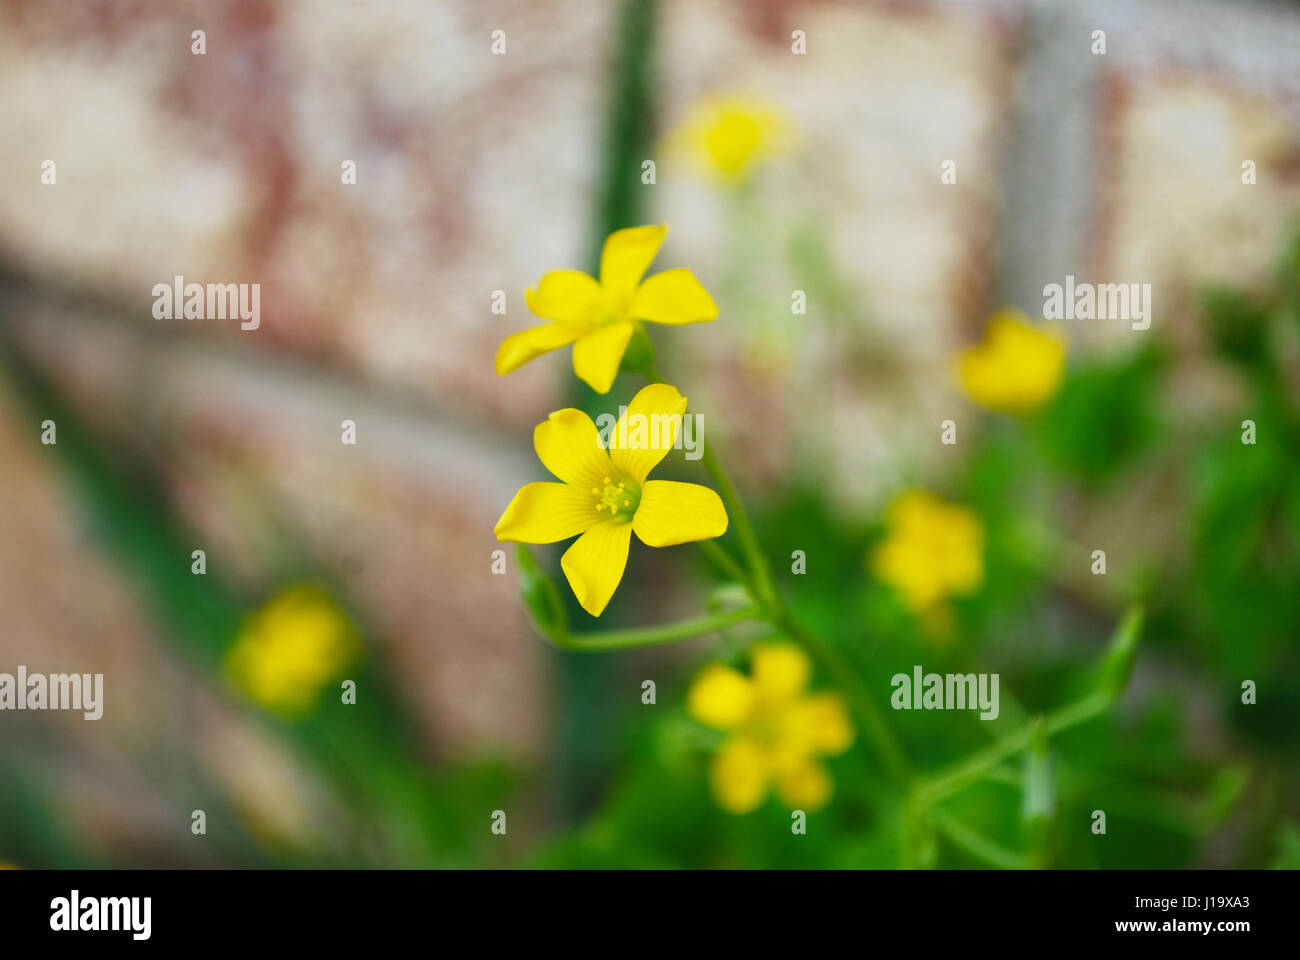 Yellow clover flower stock photos yellow clover flower stock clover yellow flower in bloom stock image mightylinksfo